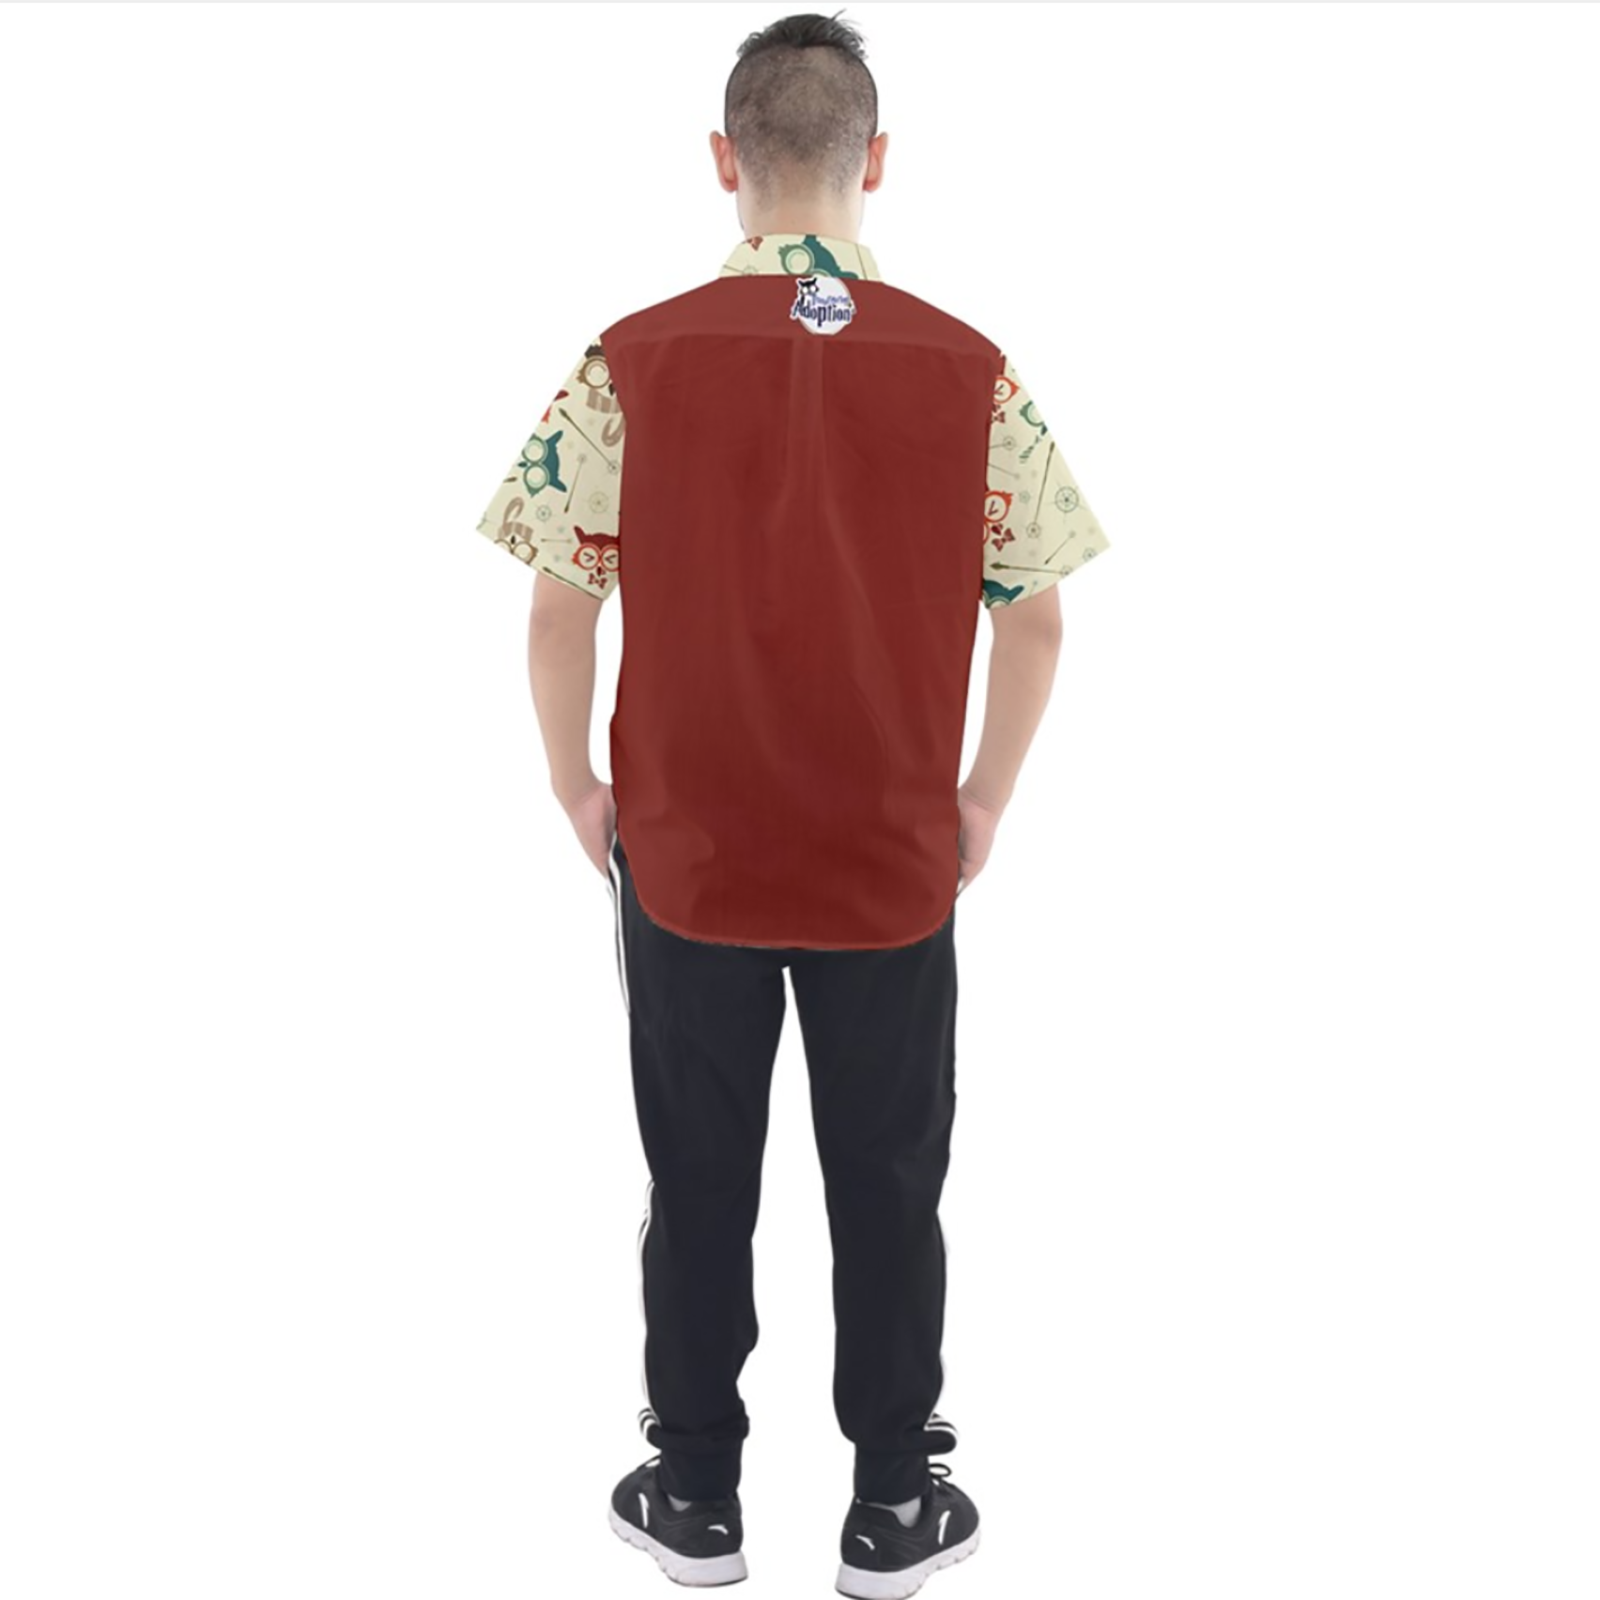 Vintage Emoji Owl Button Up Short Sleeve Shirt (Red Solid Background)